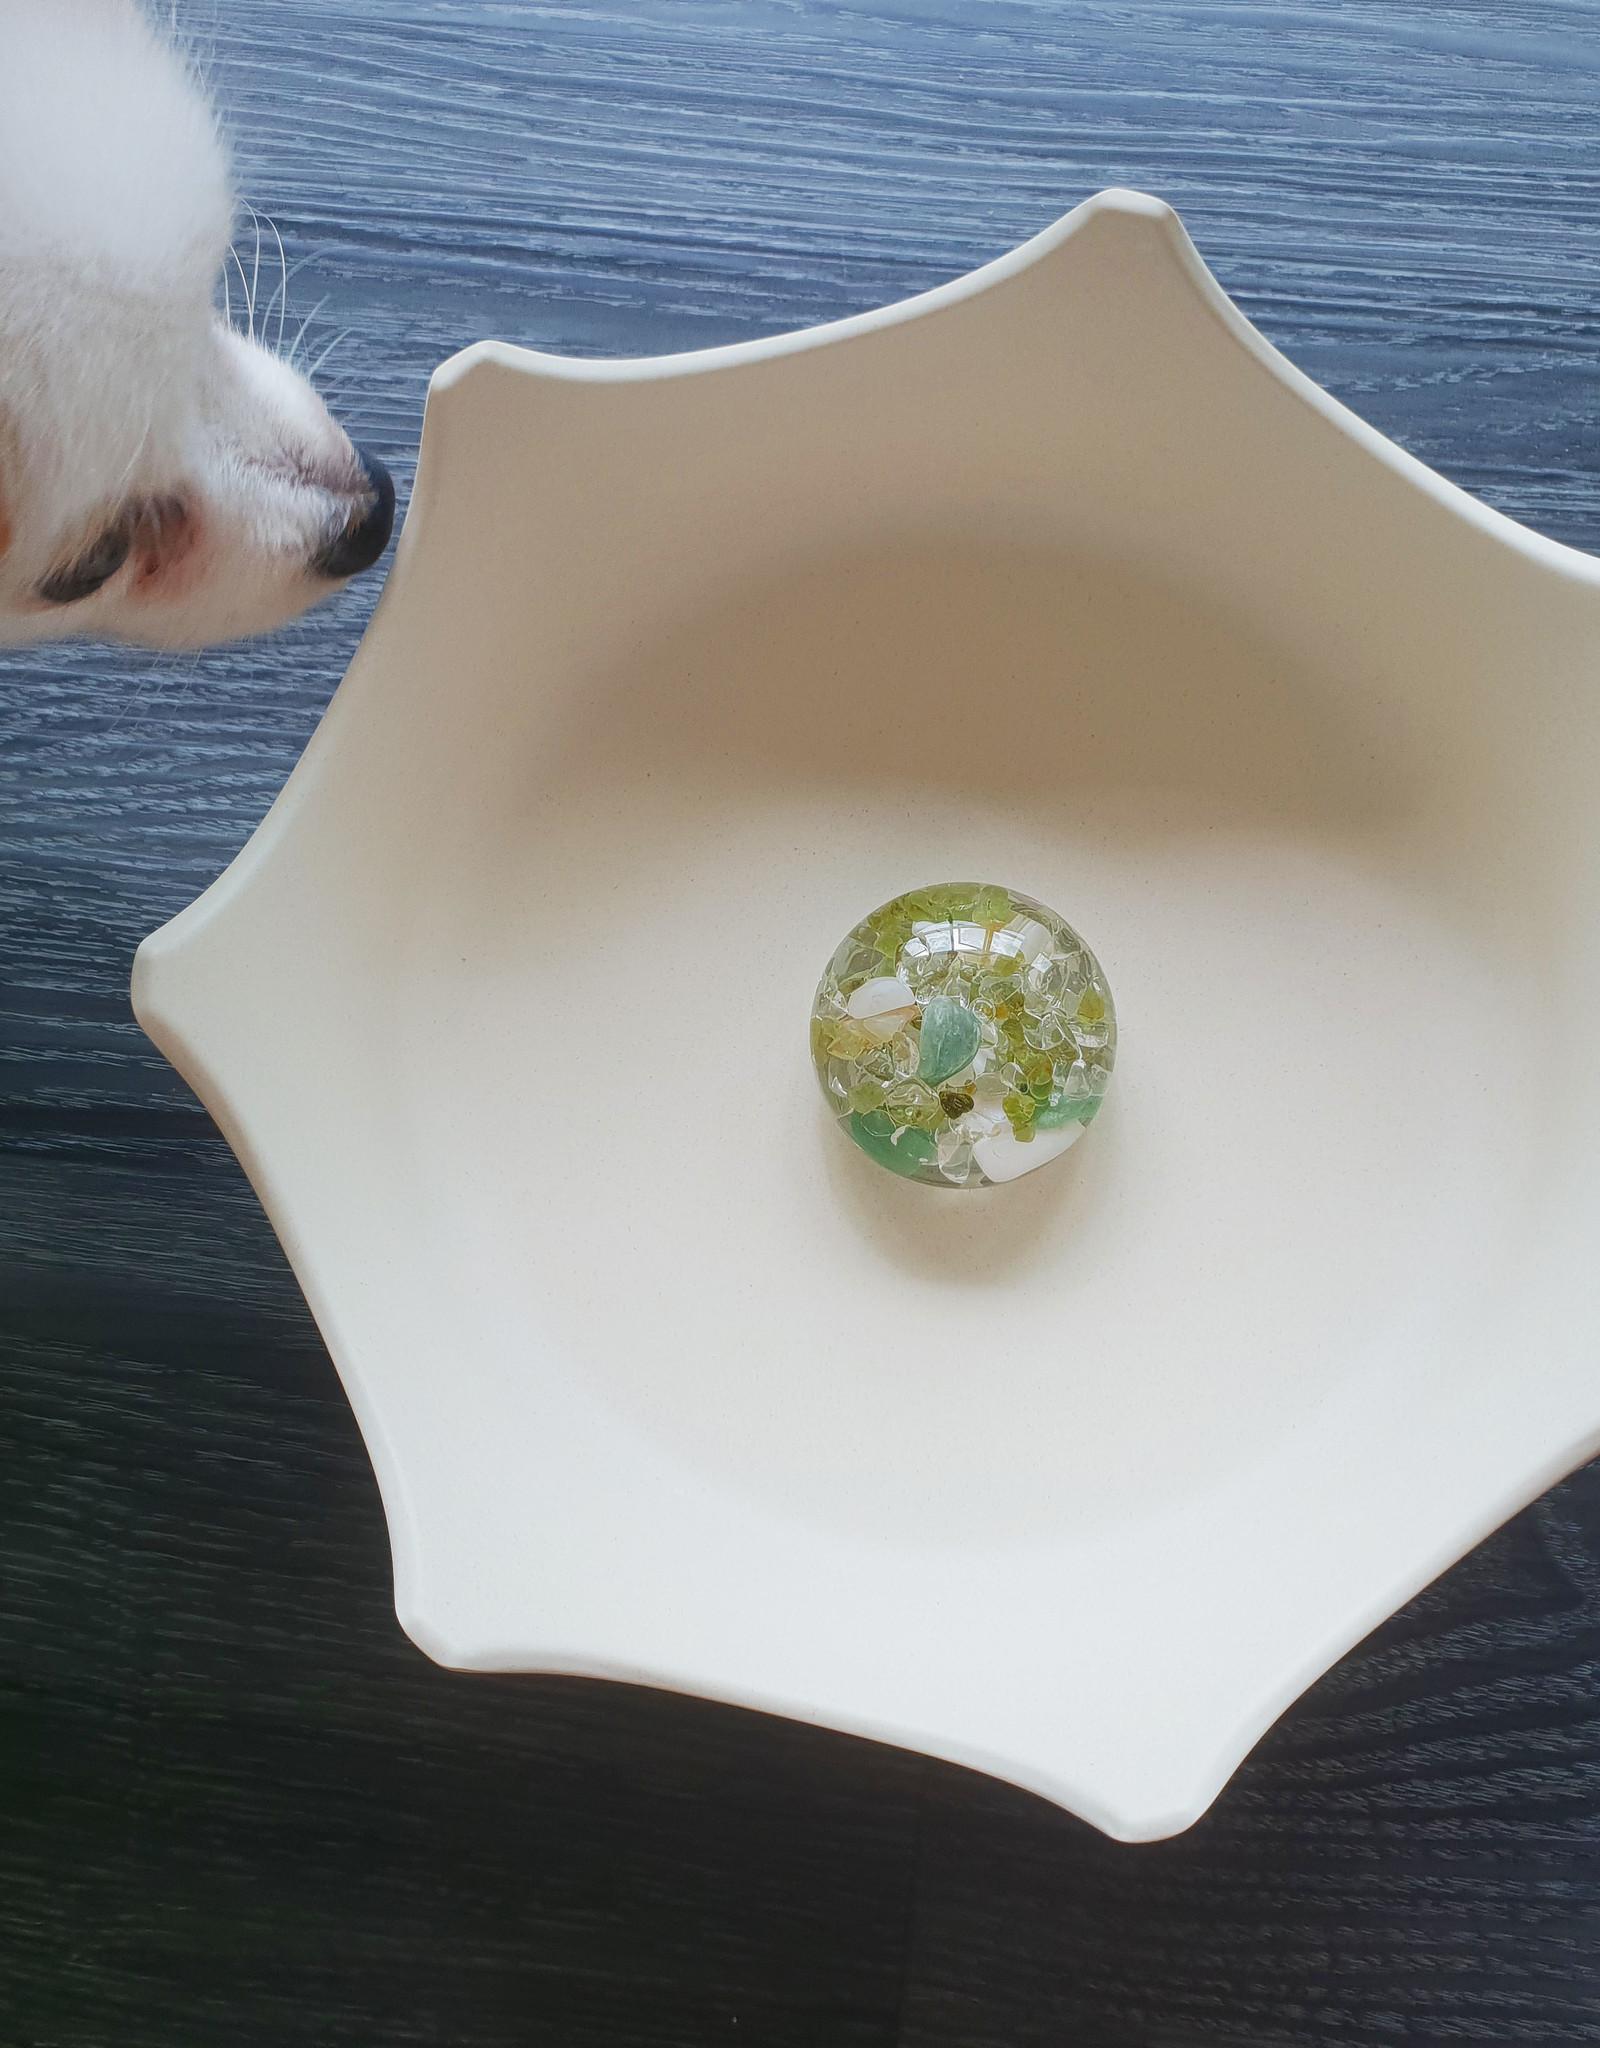 Gem Water Gem-Water CrownJuwel Pet Bowls by VitaJuwel